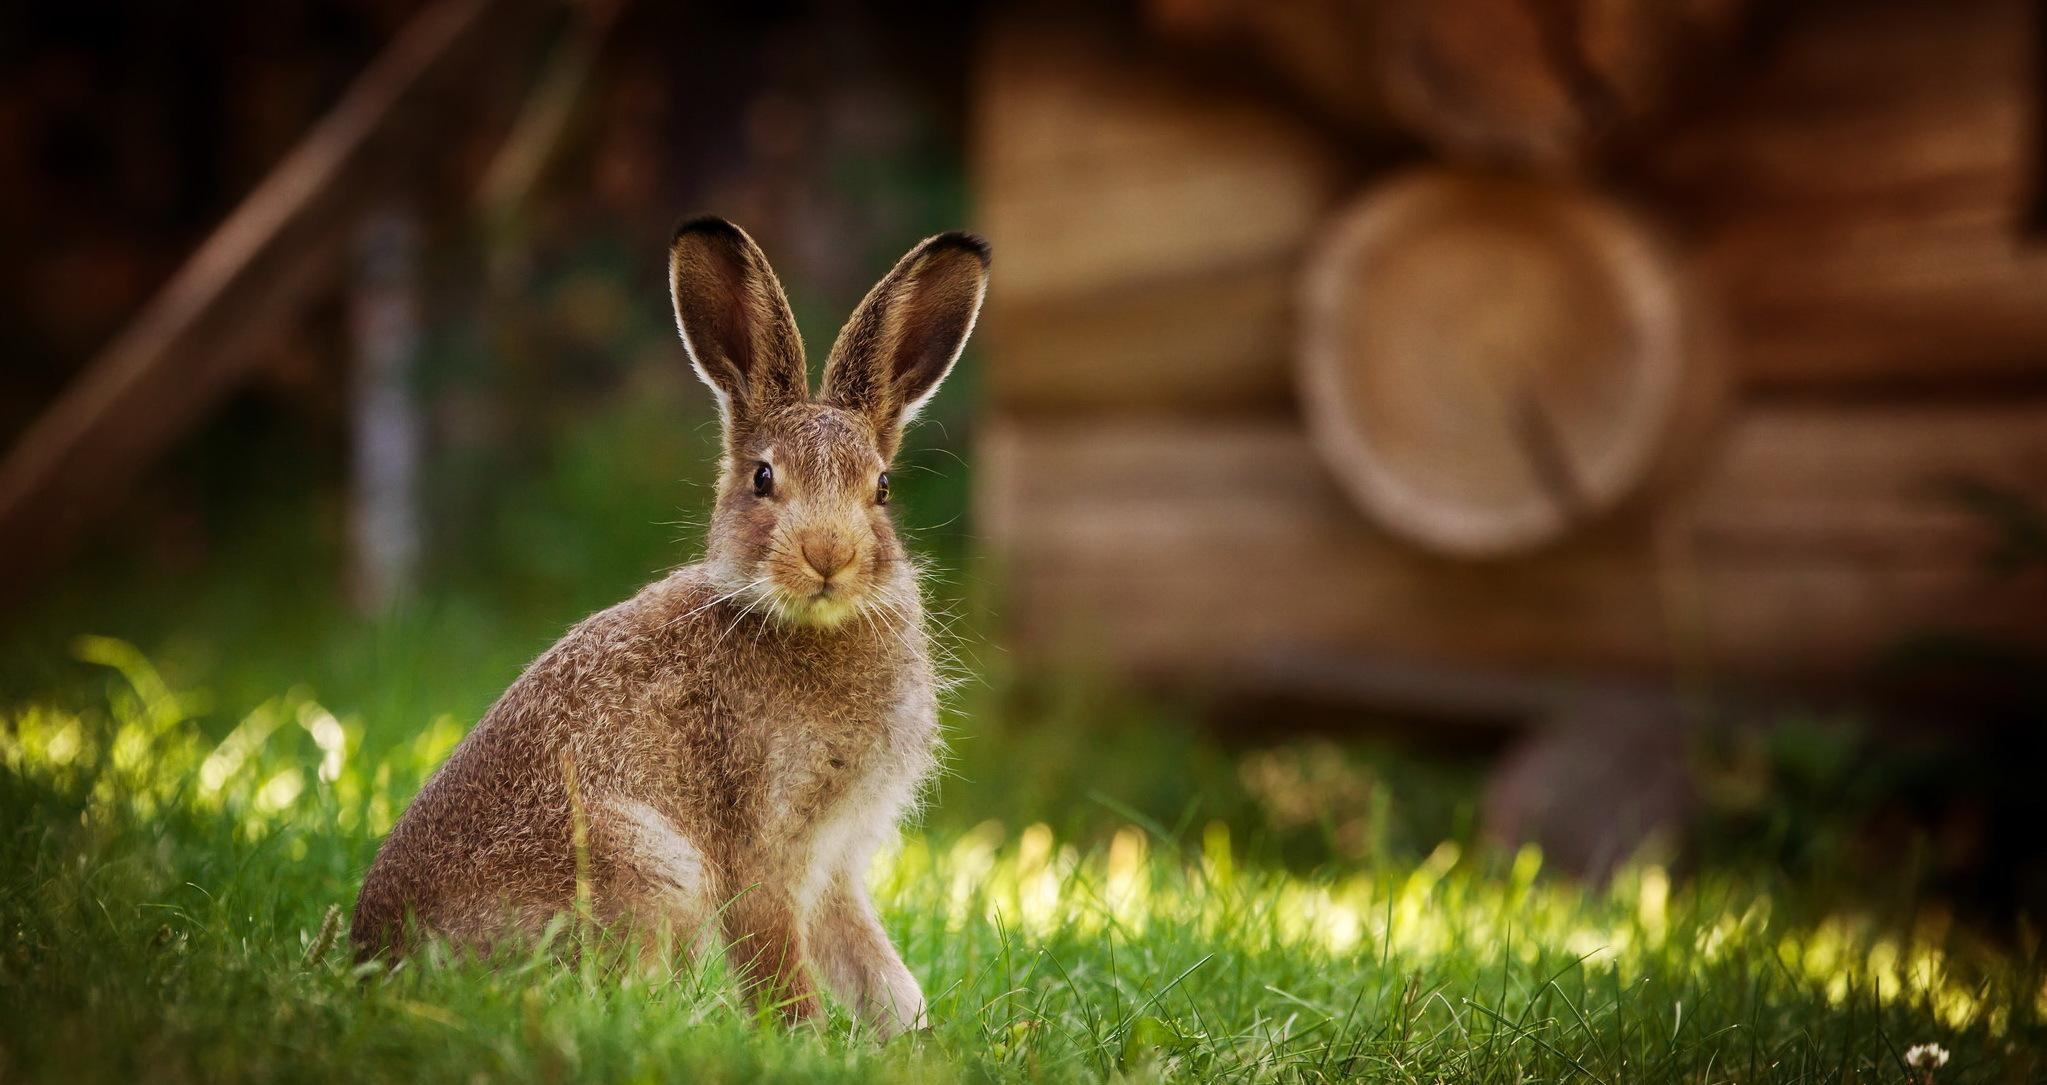 кролик девушка природа животное  № 1594137 бесплатно